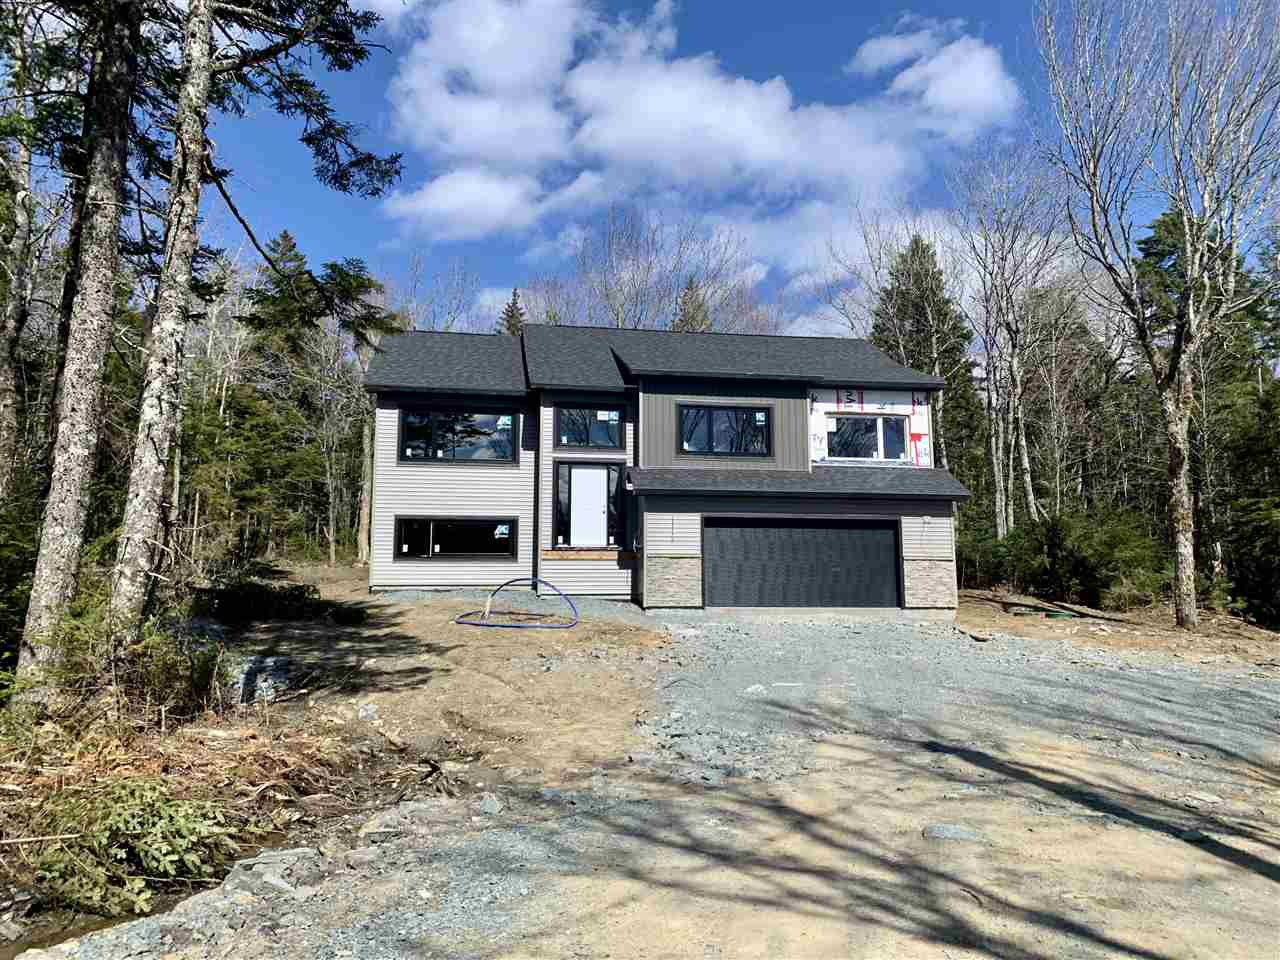 Main Photo: Lot 722 95 Gaspereau Run in Sackville: 26-Beaverbank, Upper Sackville Residential for sale (Halifax-Dartmouth)  : MLS®# 201924699